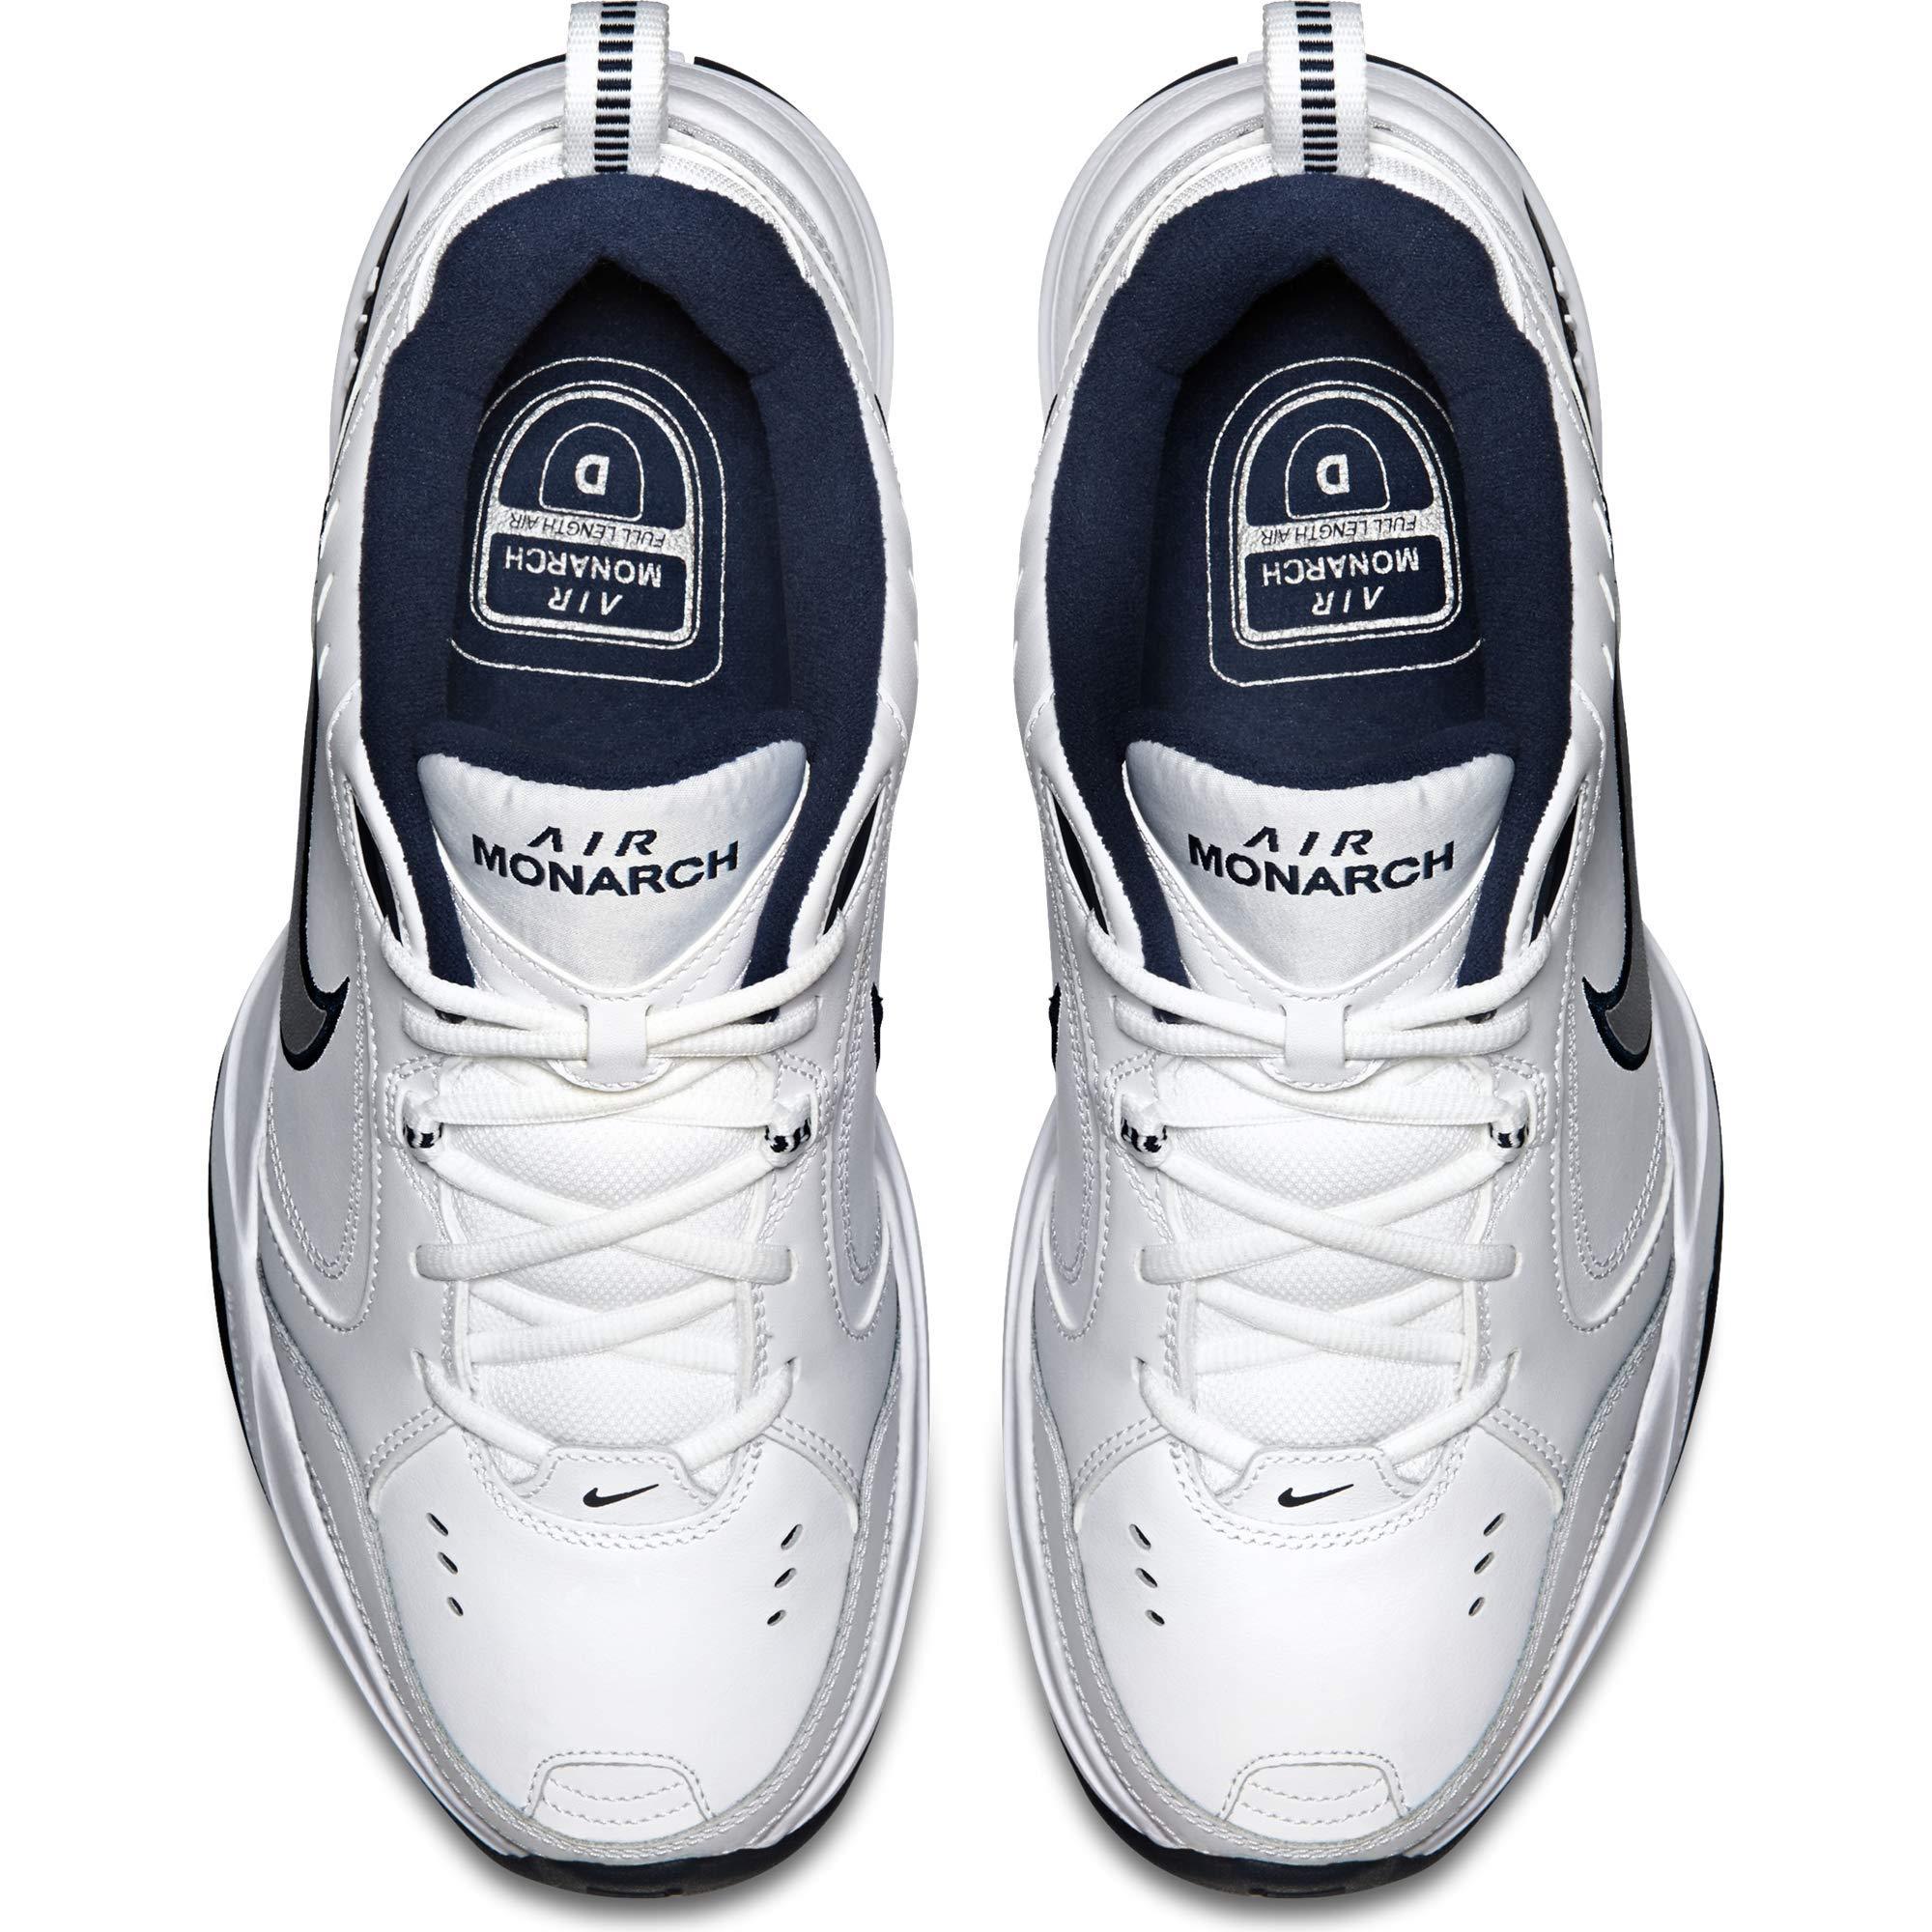 NIKE AIR MONARCH IV (MENS) - 6.5 White/Metallic Silver by Nike (Image #10)